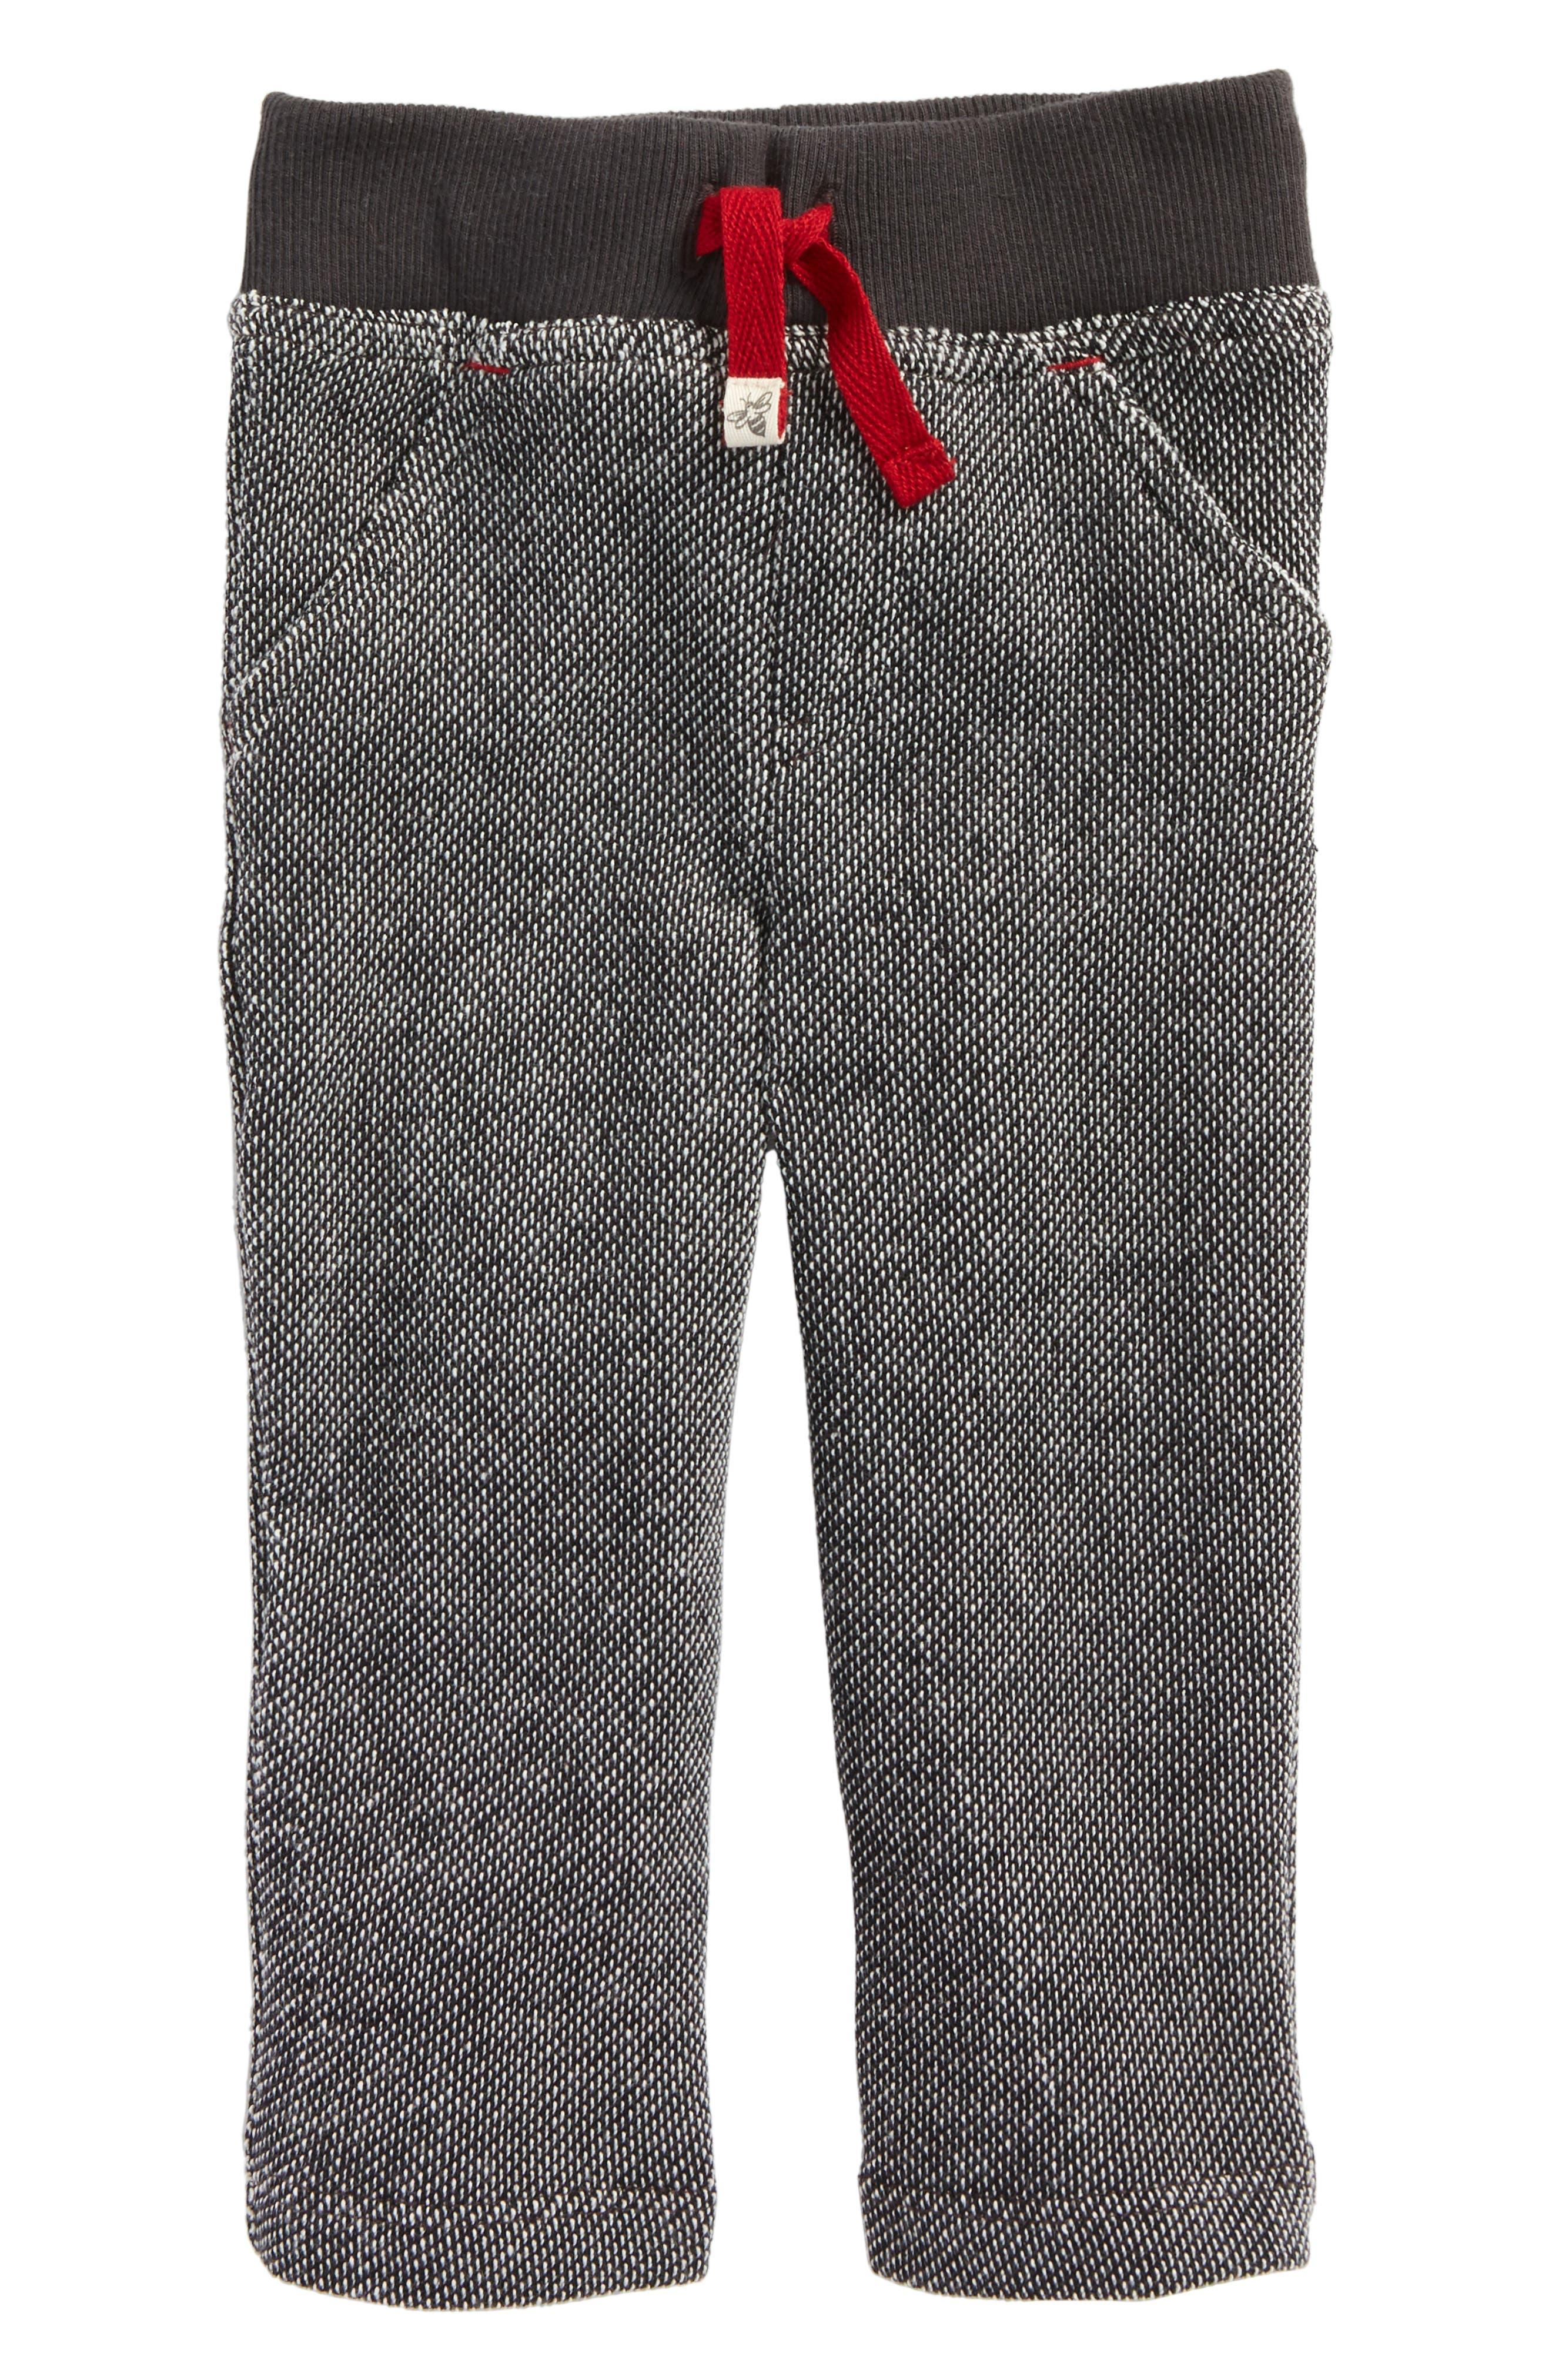 Main Image - Burt's Bees Baby Piqué Organic Cotton Pants (Baby Boys)